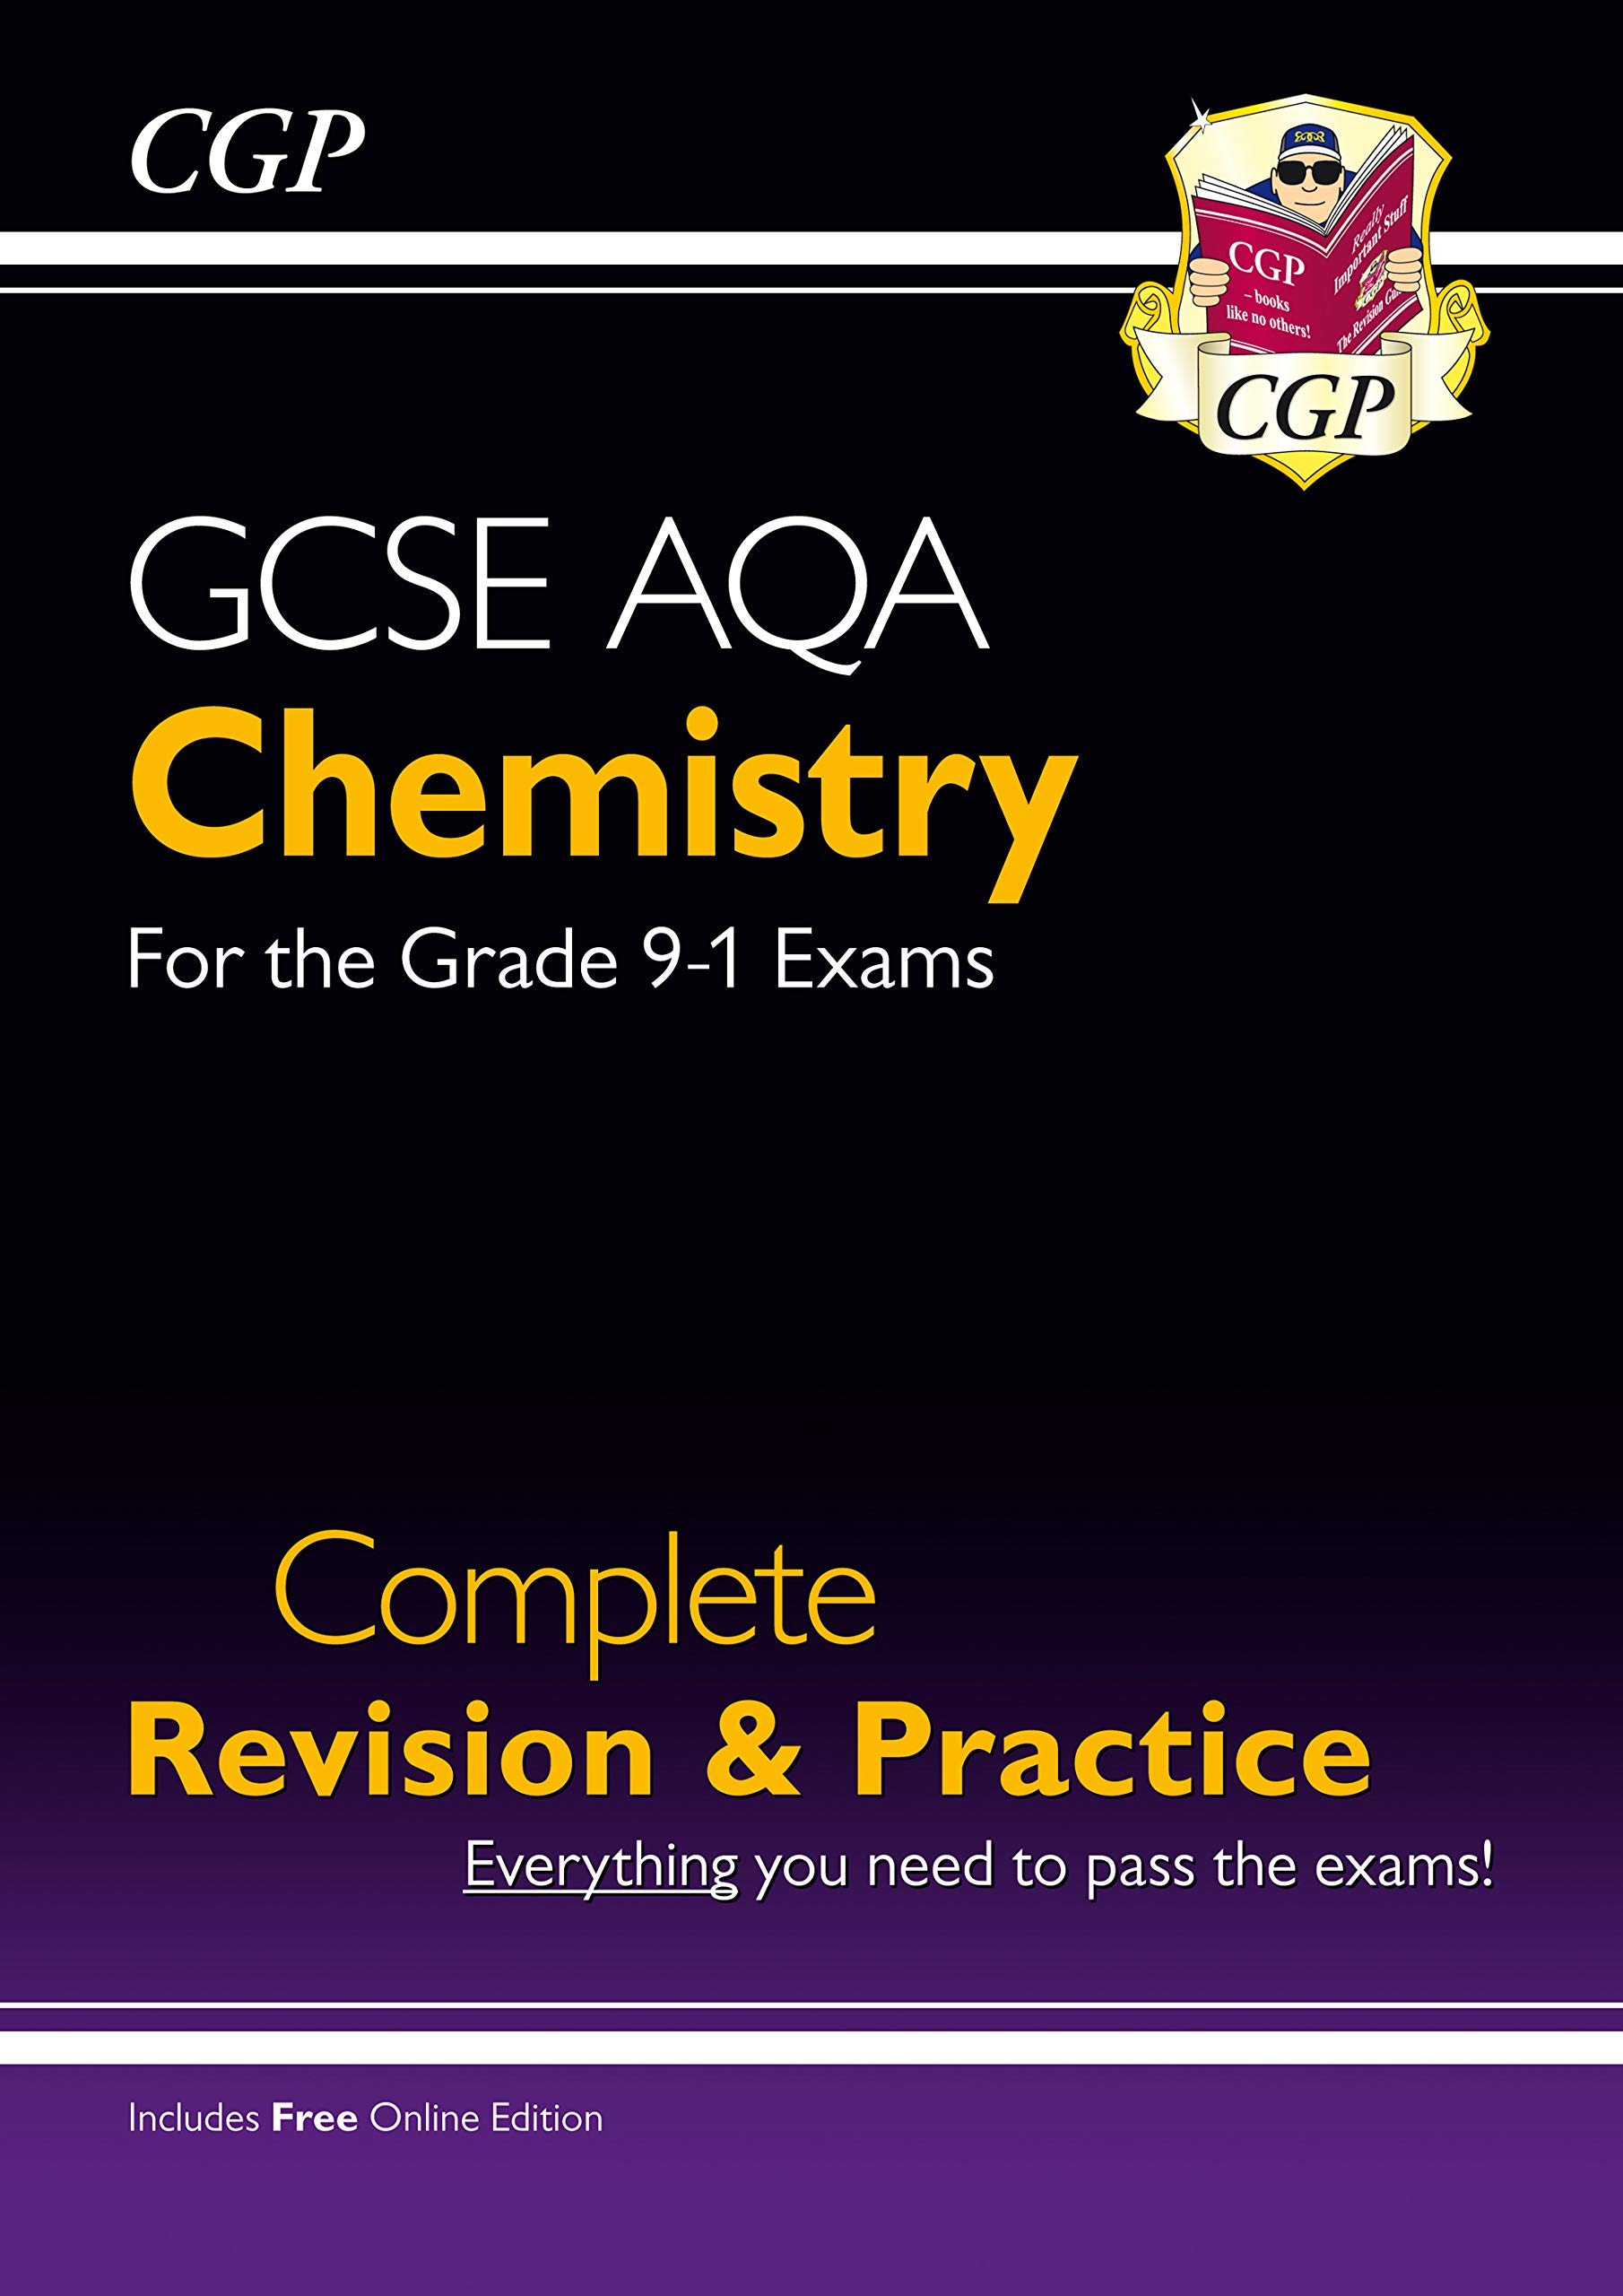 Grade 9-1 GCSE Chemistry AQA Complete Revision & Practice